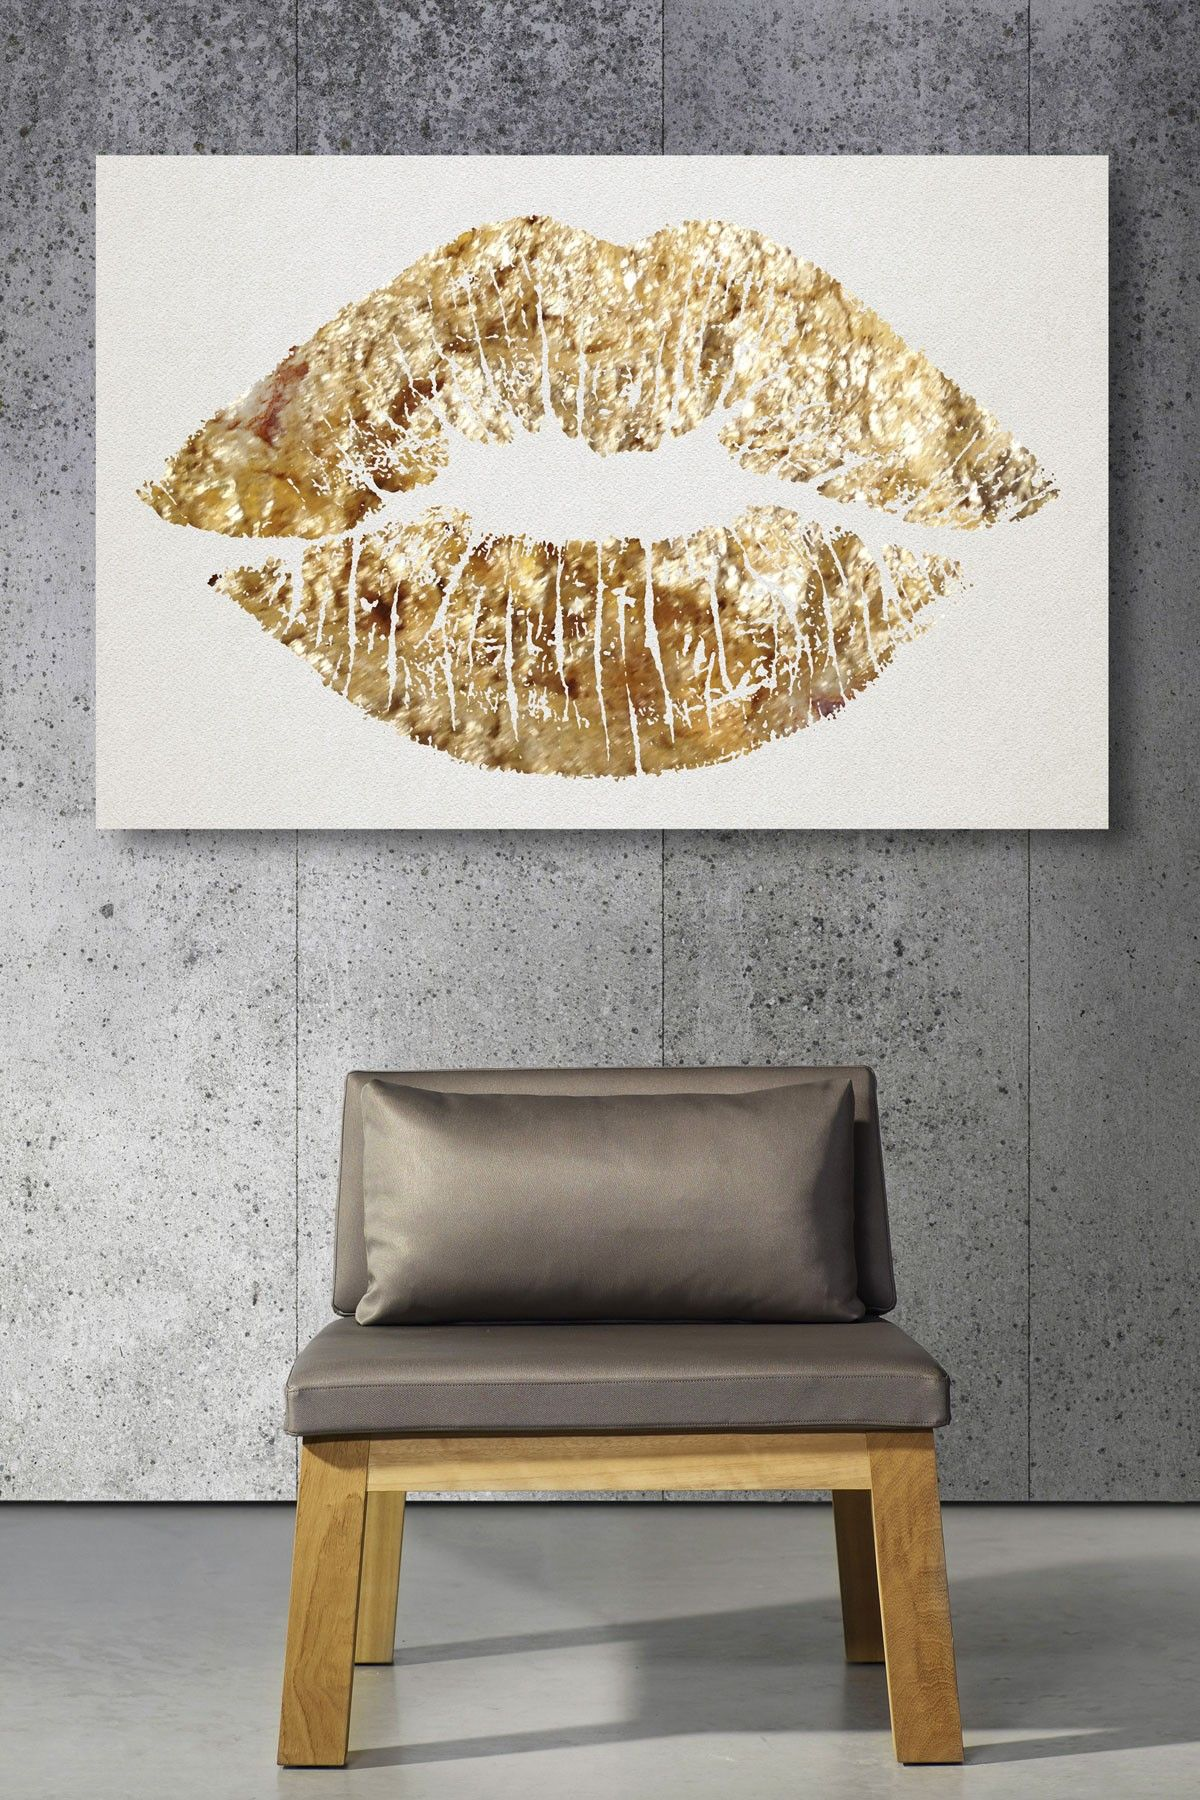 Gold ゴームド Gōrudo Gylden Oro Metal Metallic